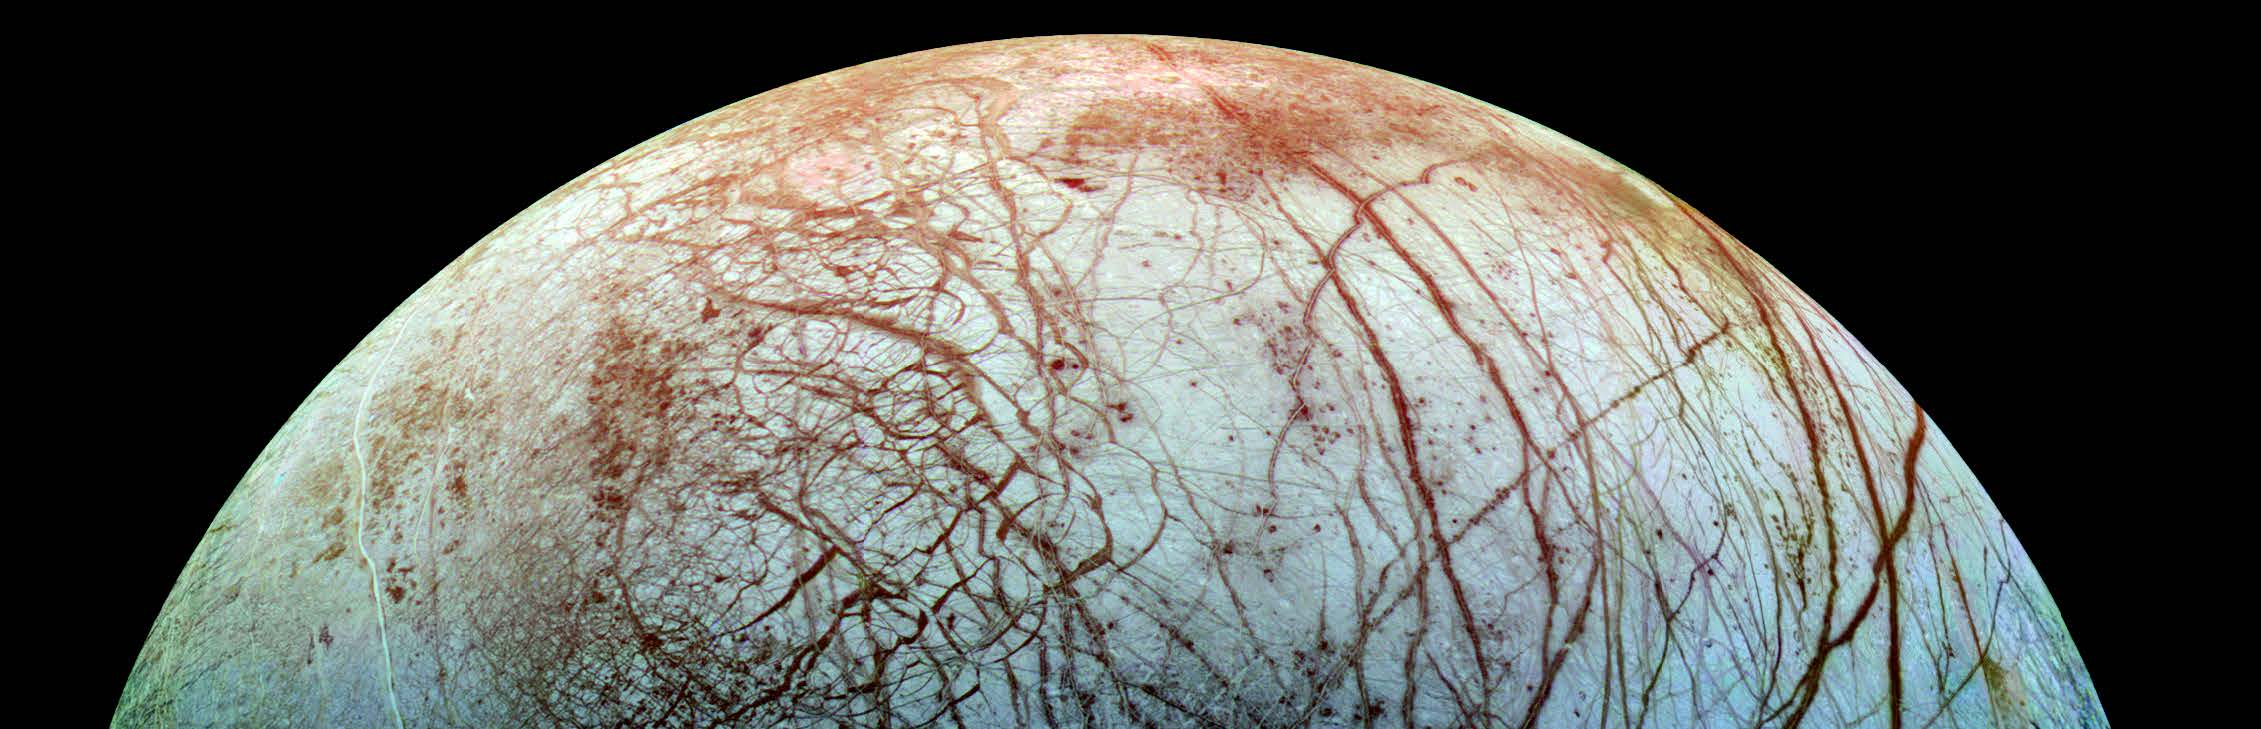 Image of Jupiter's moon Europa